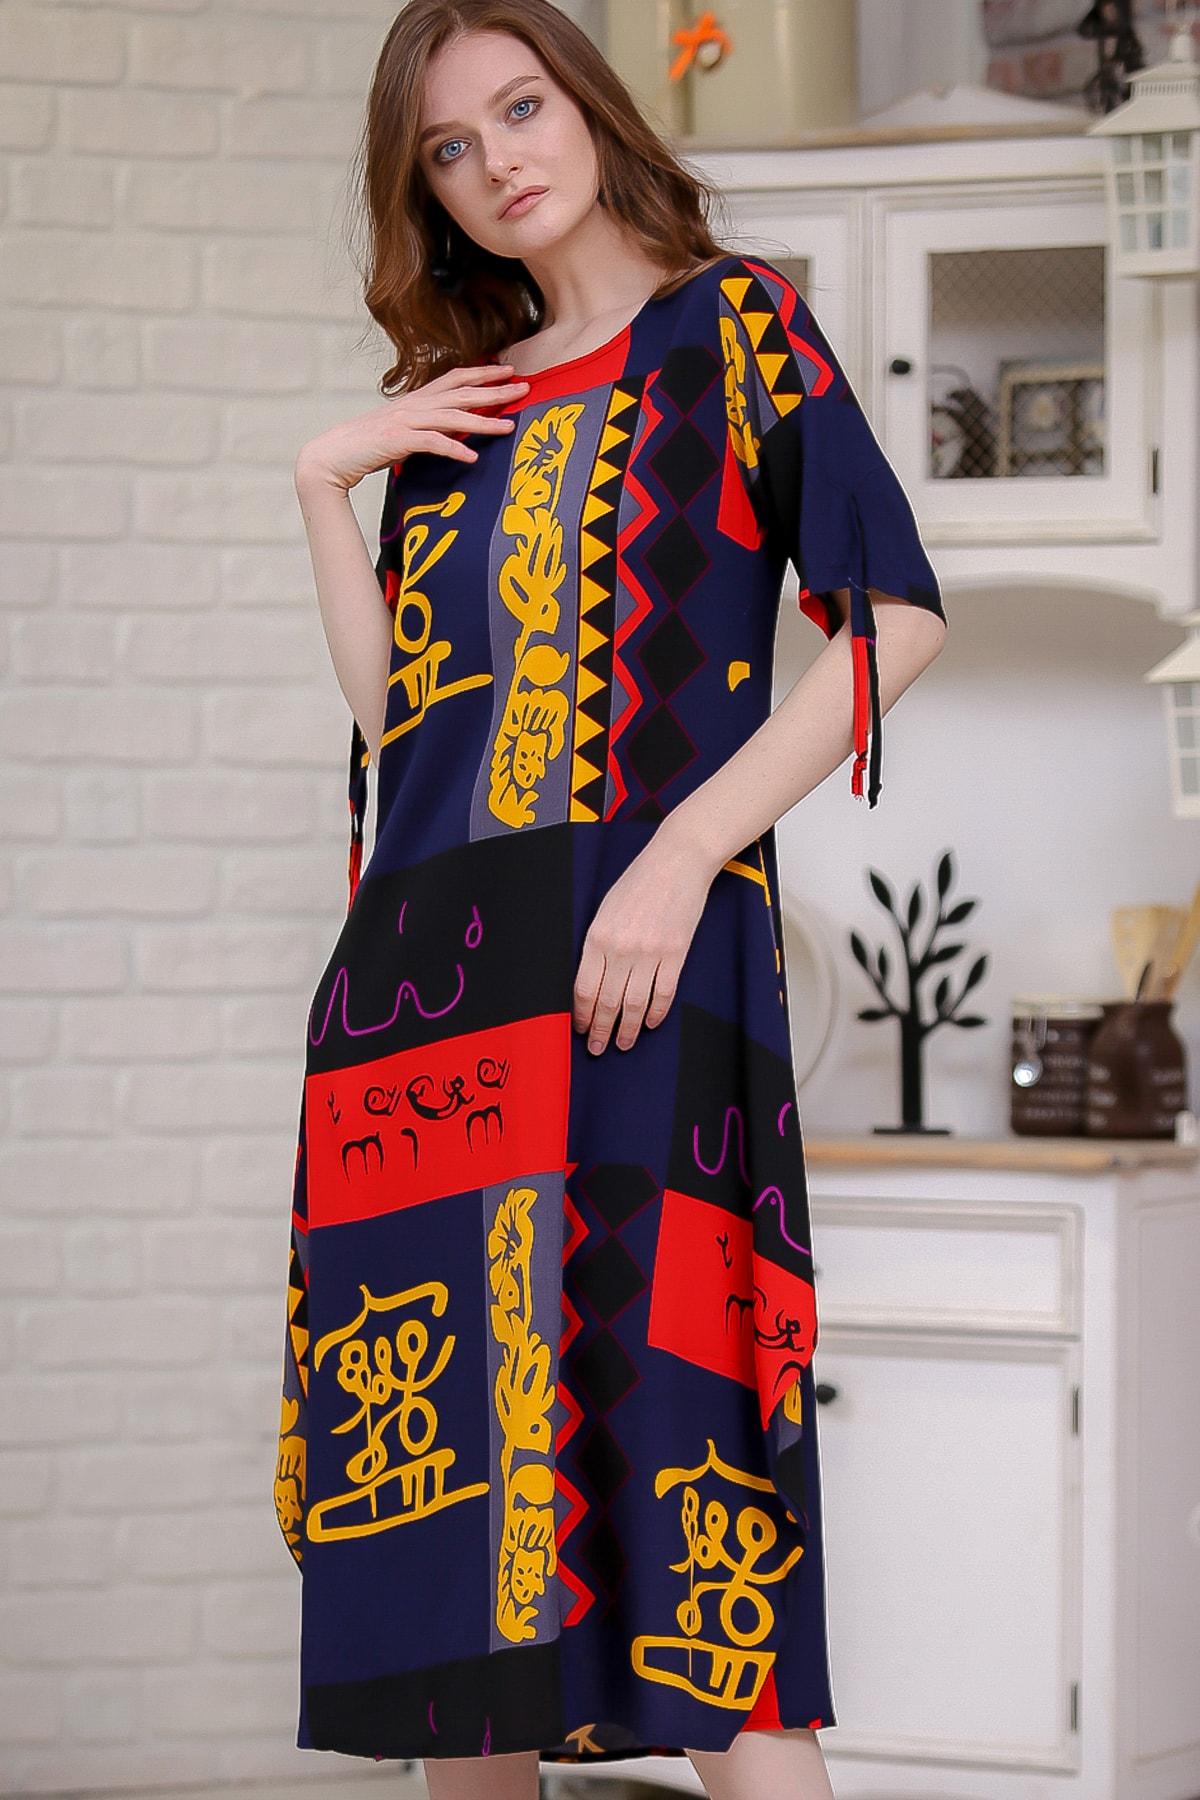 Chiccy Kadın Kırmızı-Siyah Bohem Patchwork Desenli Cep Detaylı Dokuma Salaş Elbise  M10160000EL97276